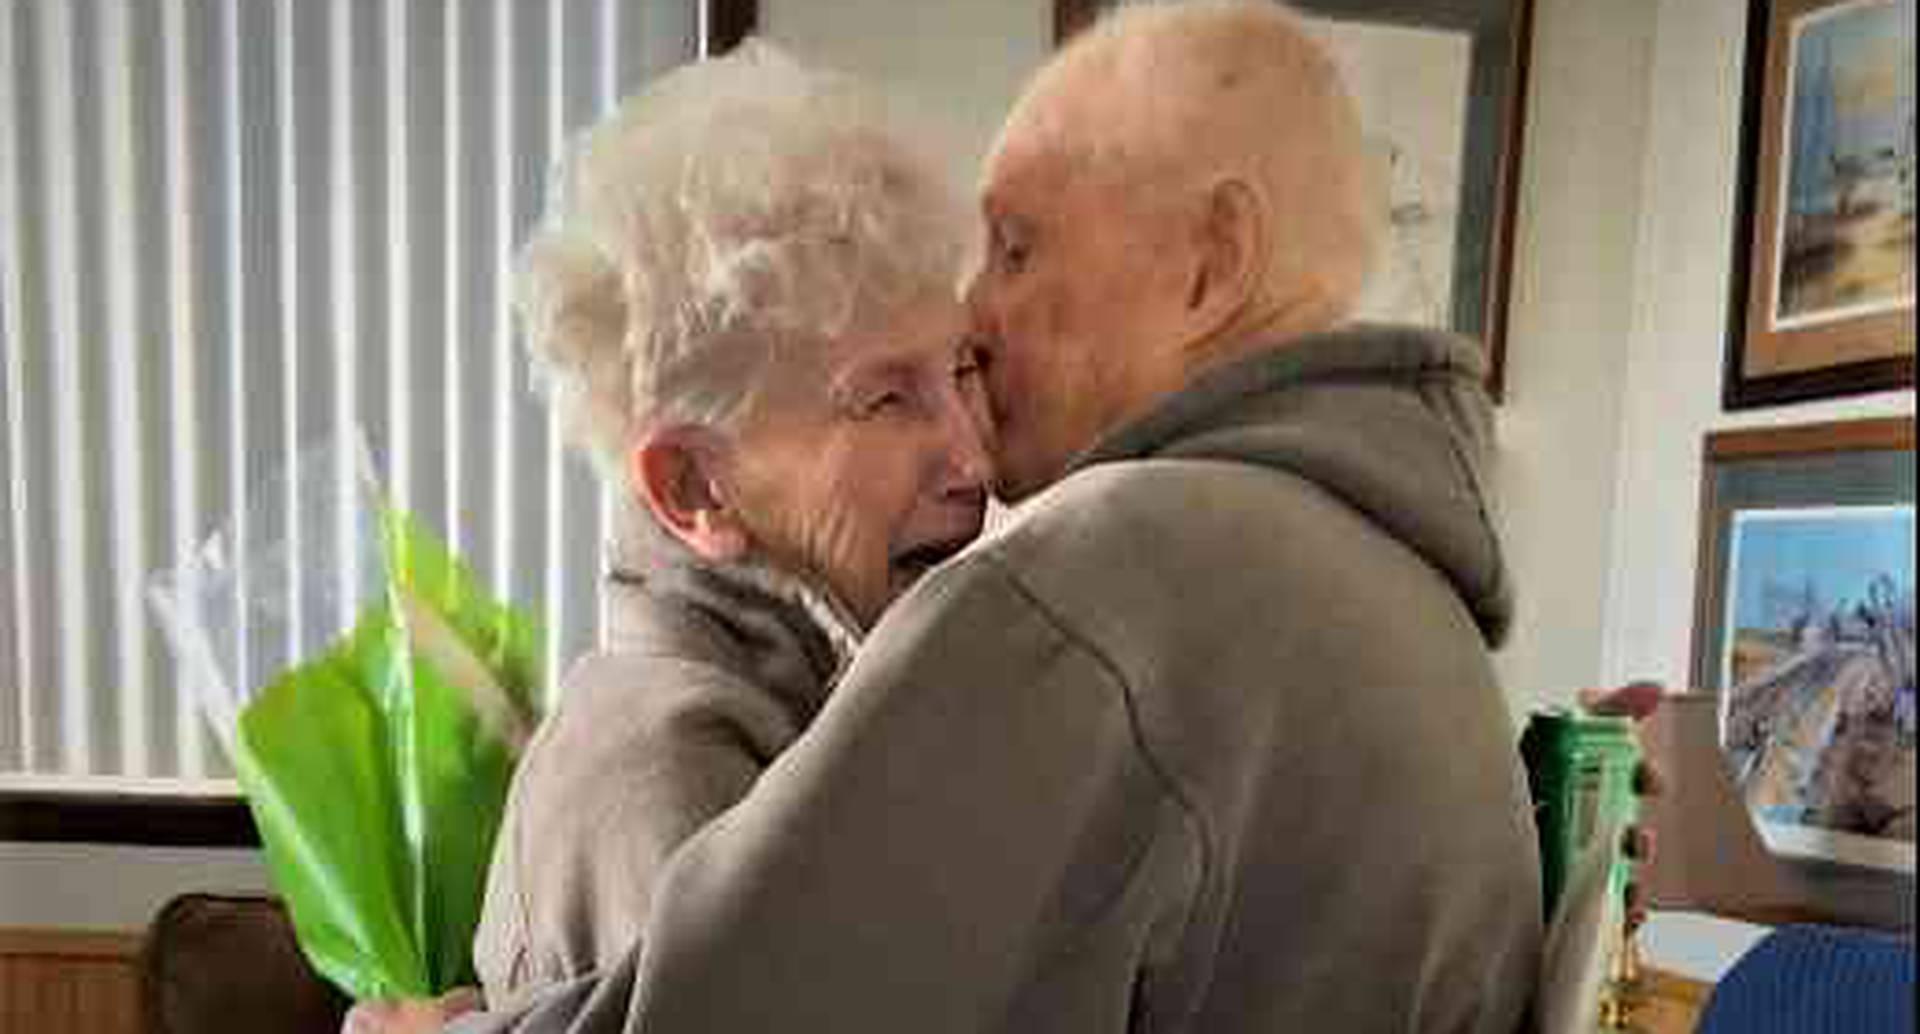 Coronavirus: dos ancianos se reencuentran tras haber sido separados por pandemia